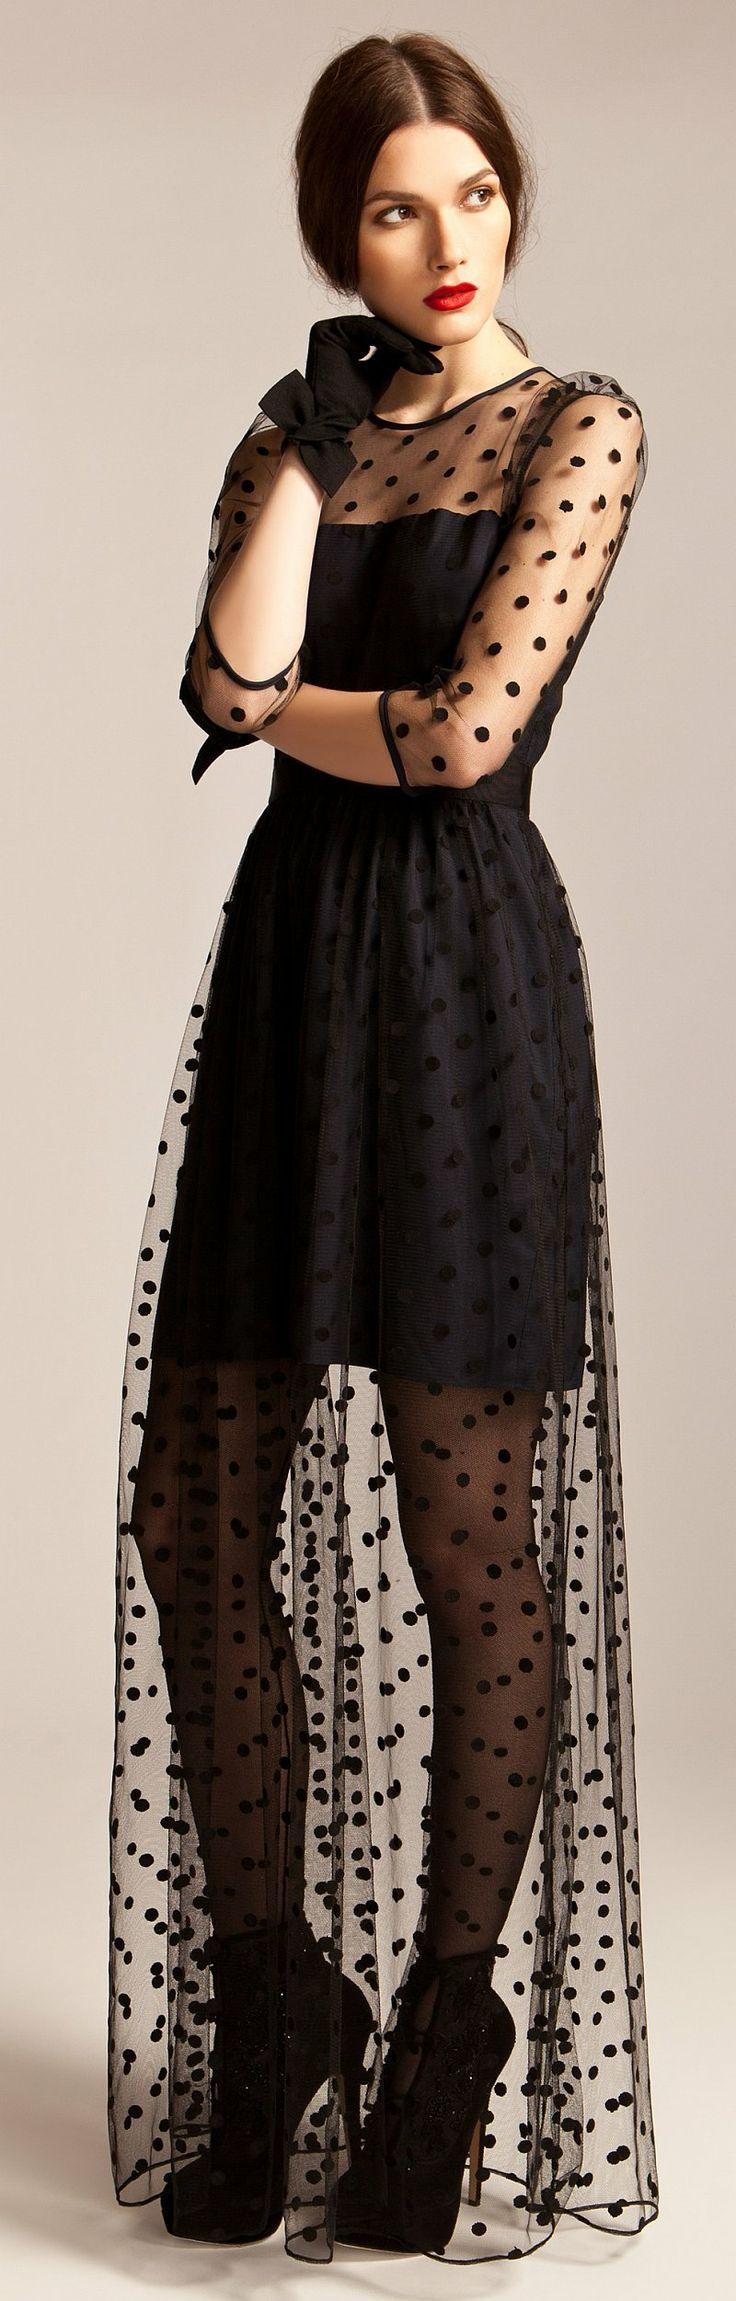 Polka Dot Dresses – Cuteness Overload | http://hercanvas.com/polka-dot-dresses-cuteness-overload/